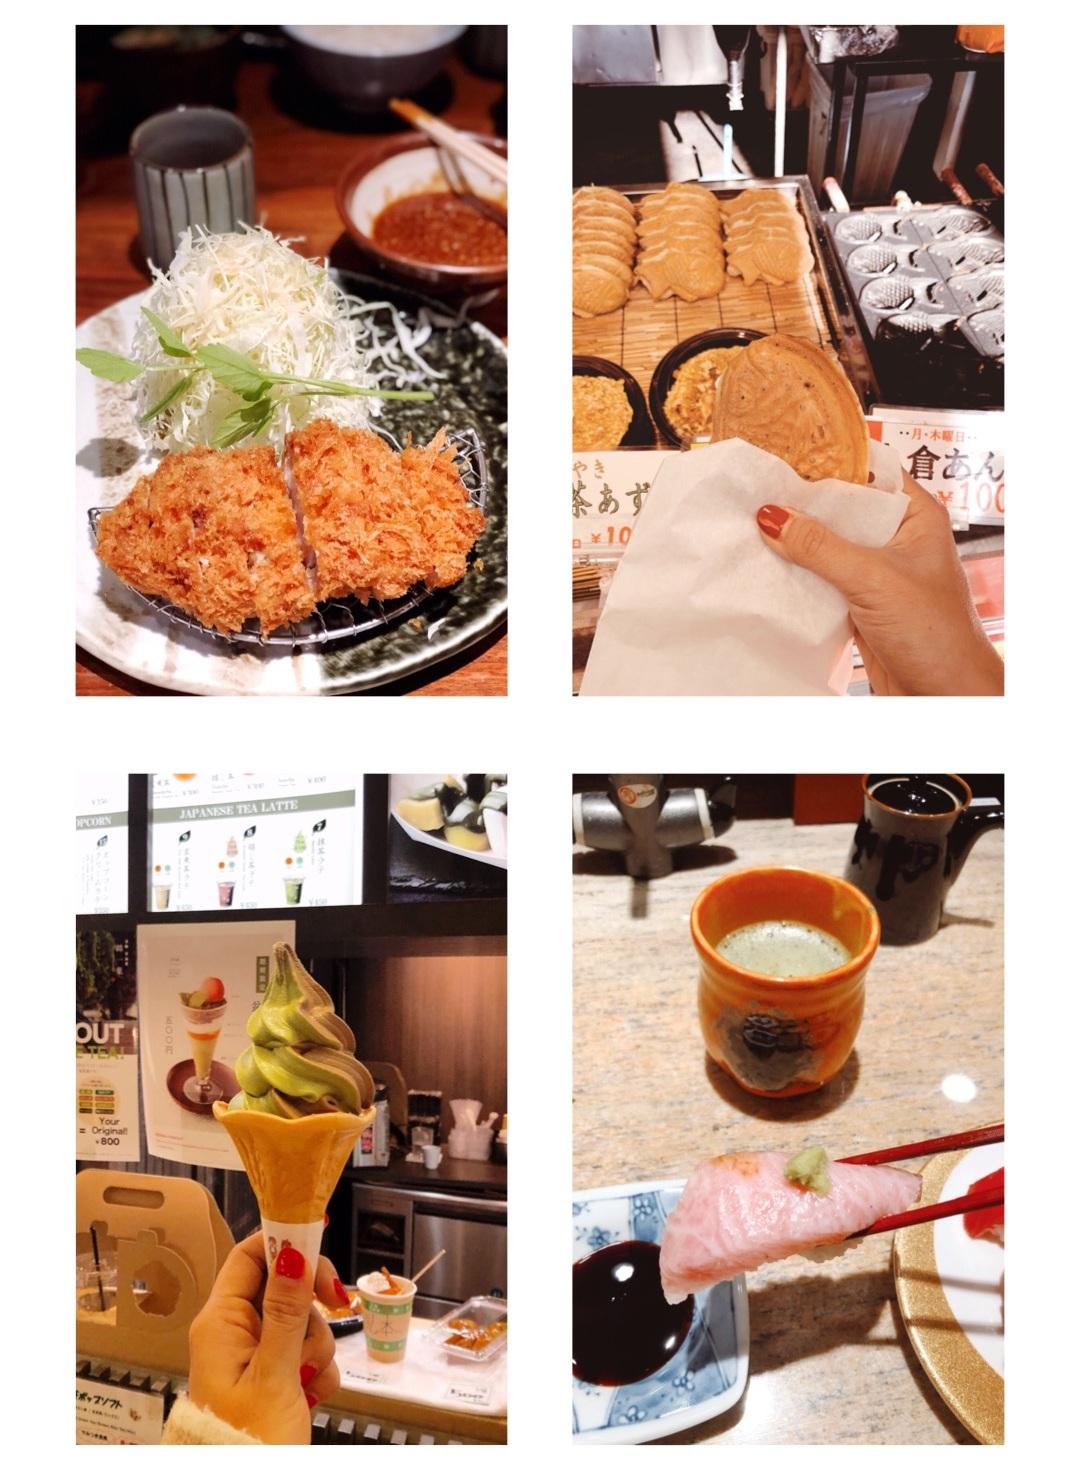 food in kyoto